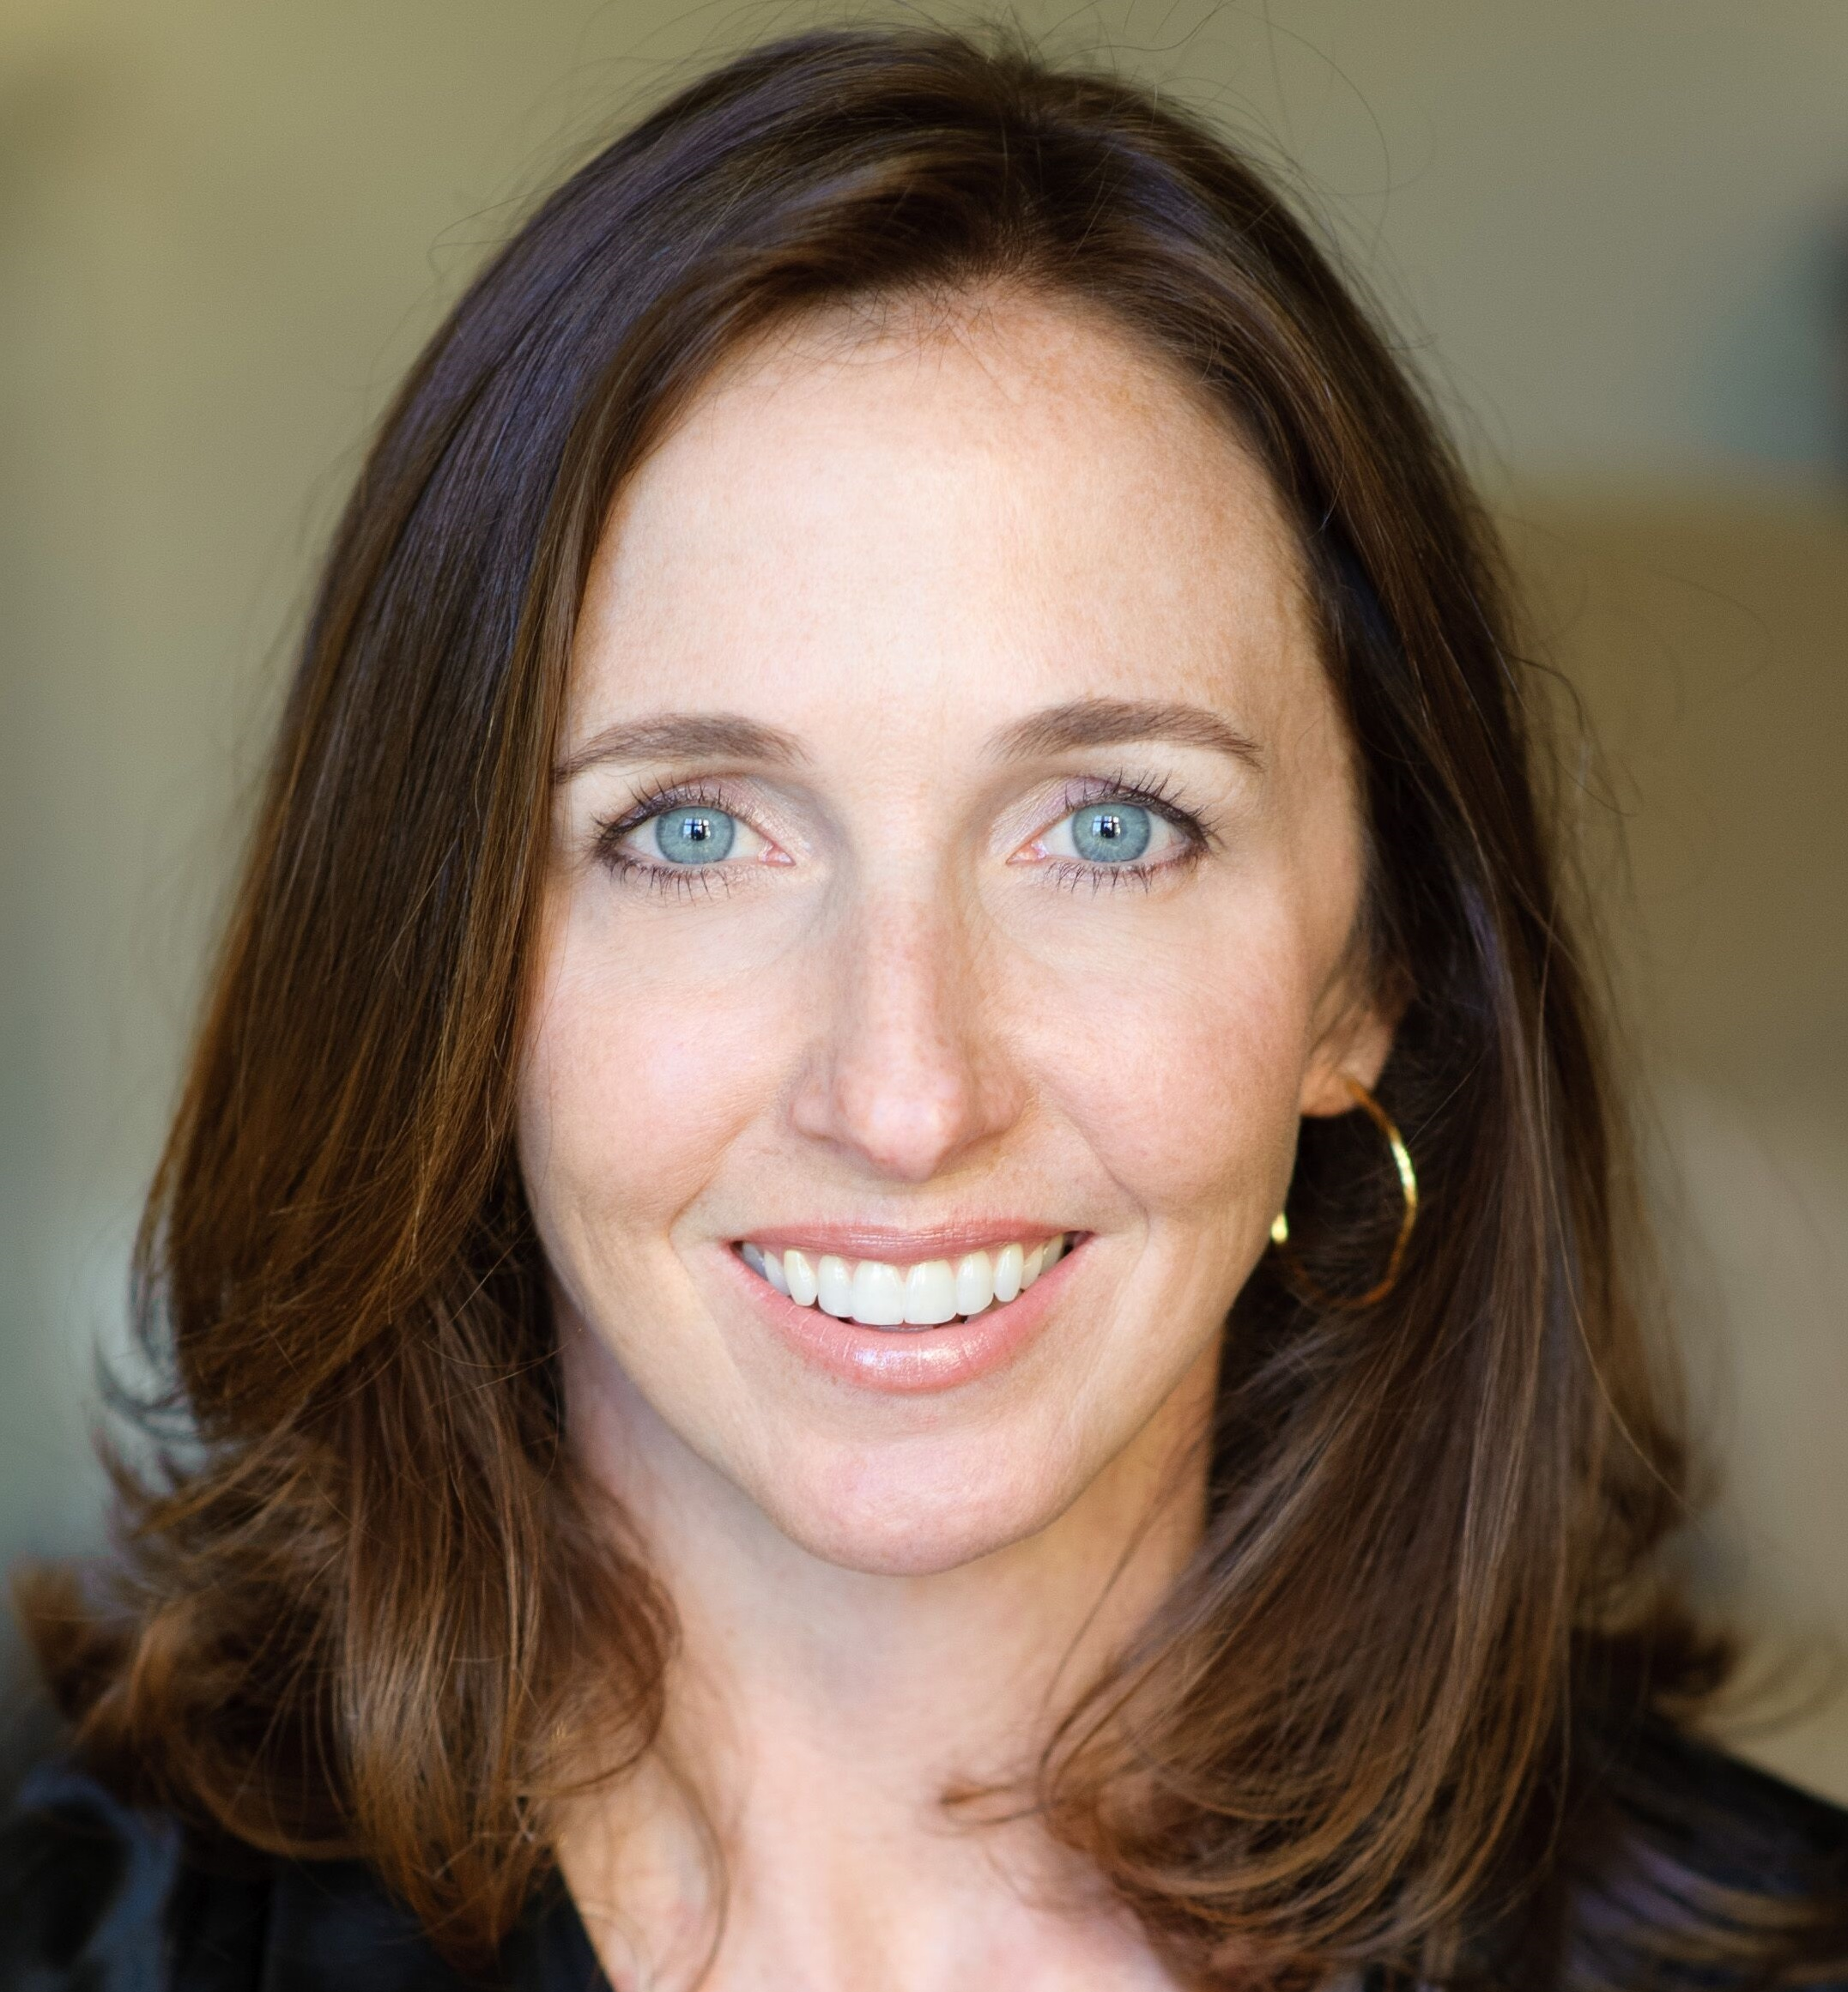 Marianne Fitzpatrick